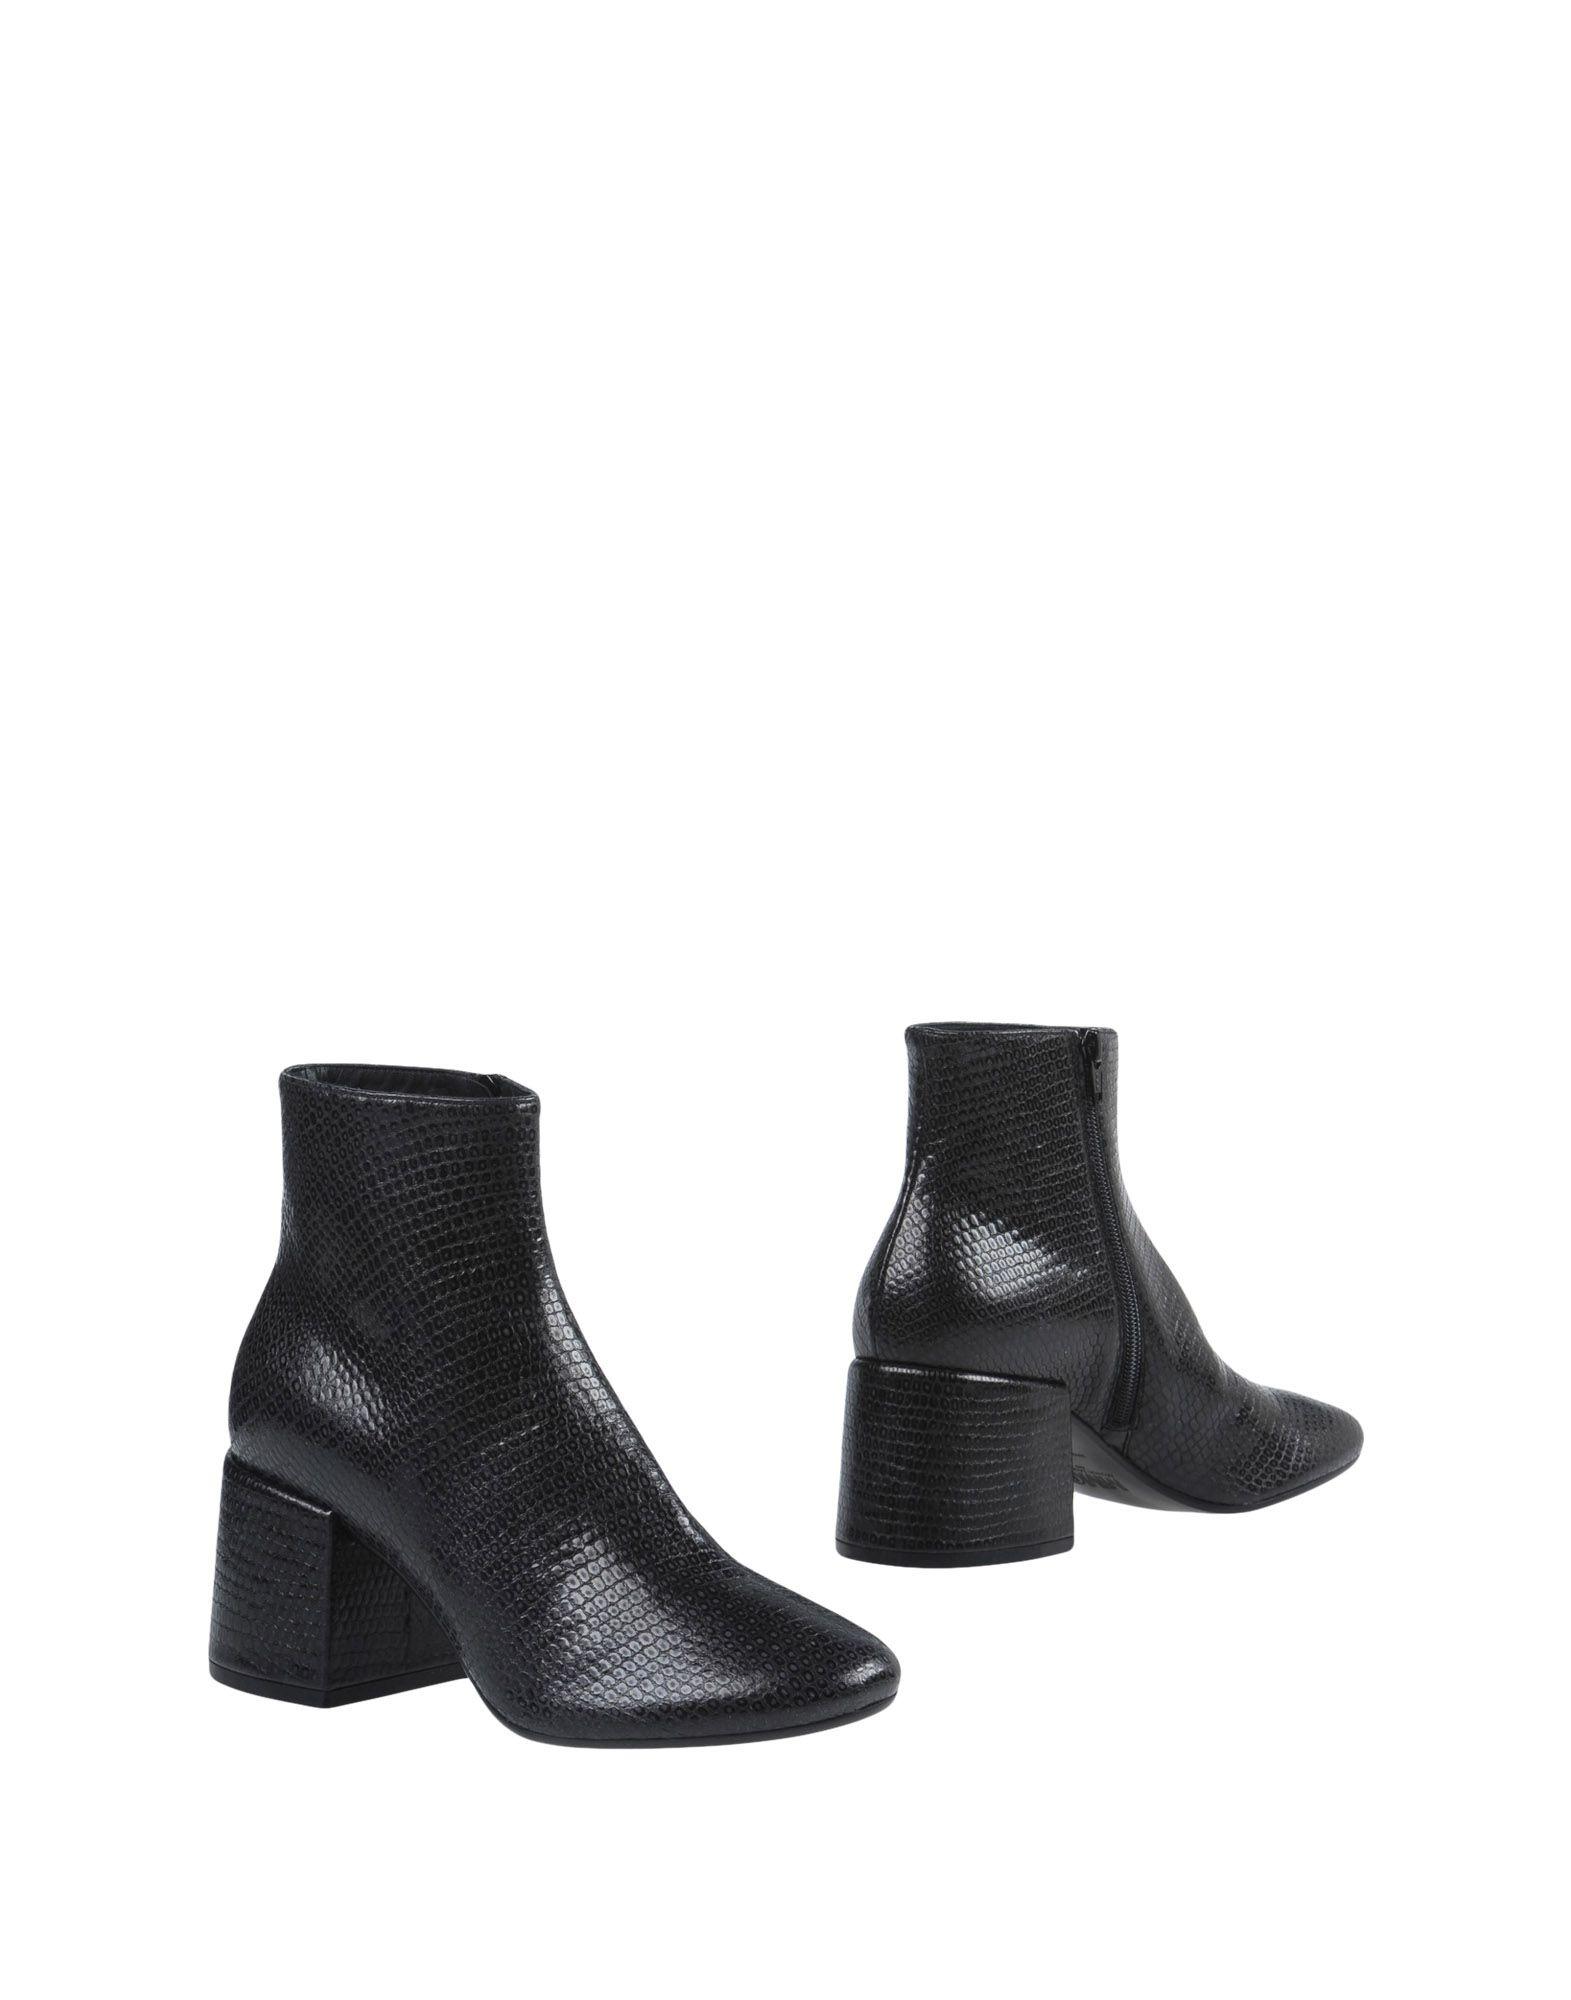 Mm6 Maison Margiela Stiefelette Damen strapazierfähige  11331353DVGut aussehende strapazierfähige Damen Schuhe 088a84